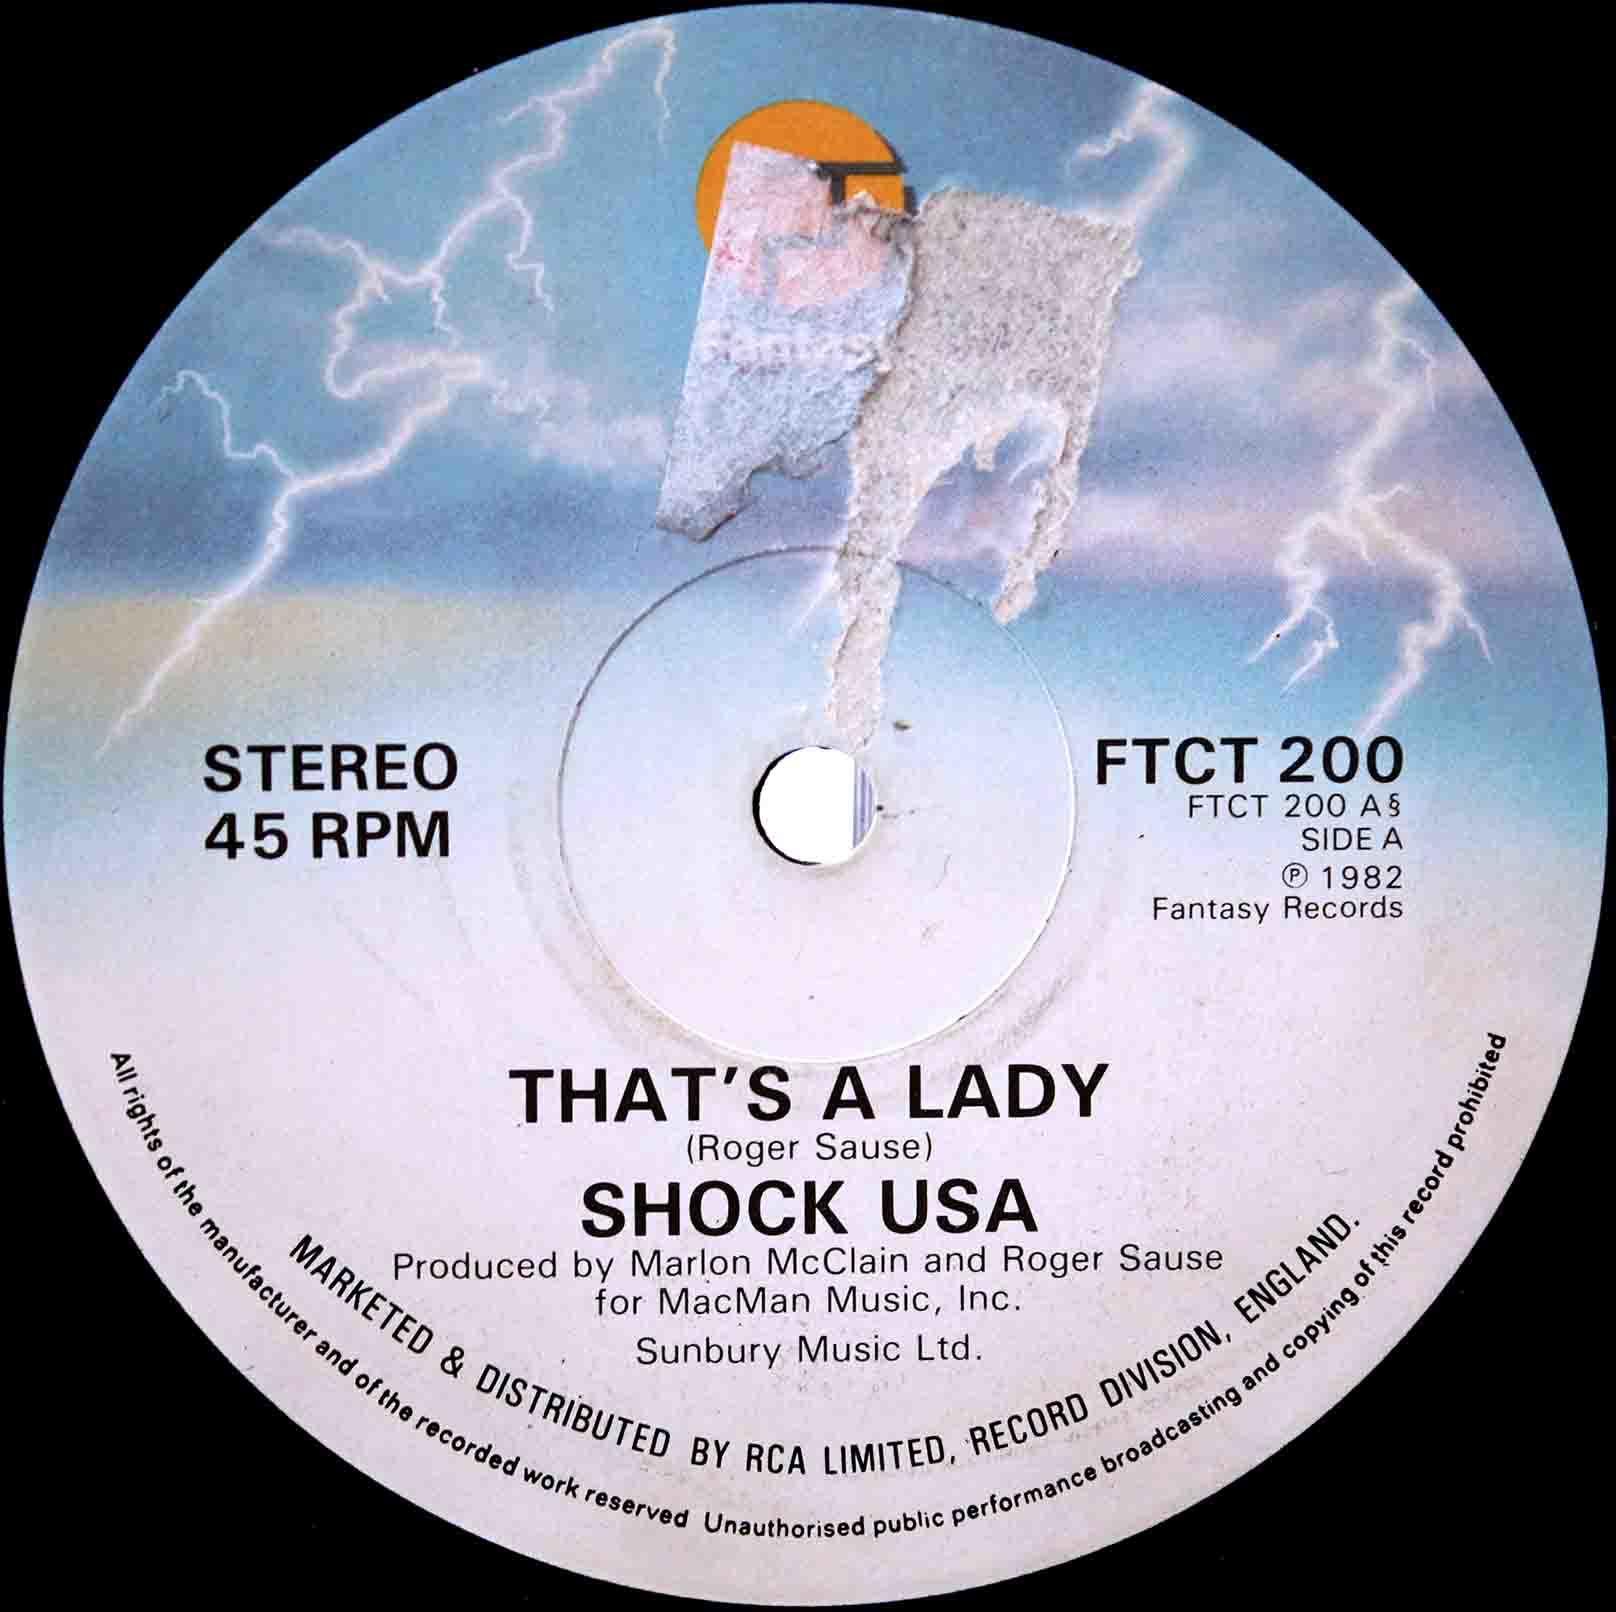 Shock Thats A Lady 03